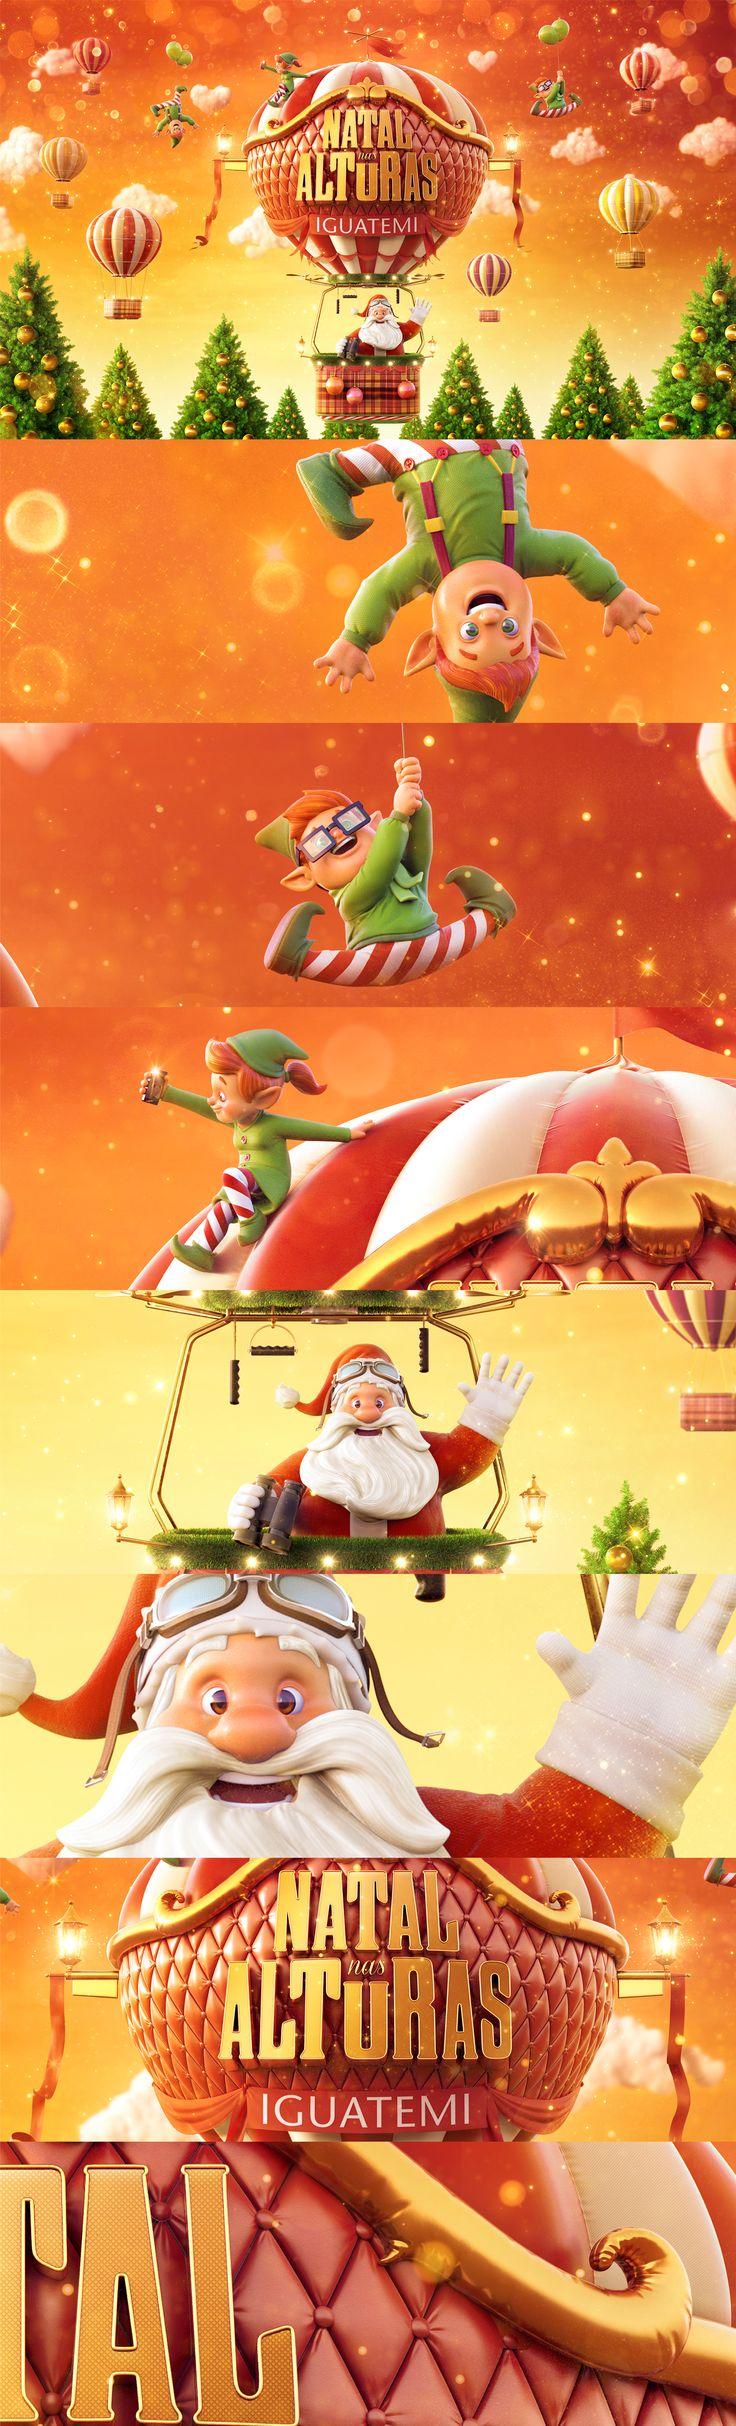 "Image produced to Iguatemi campaign ""Christmas through DM9SUL Agency."